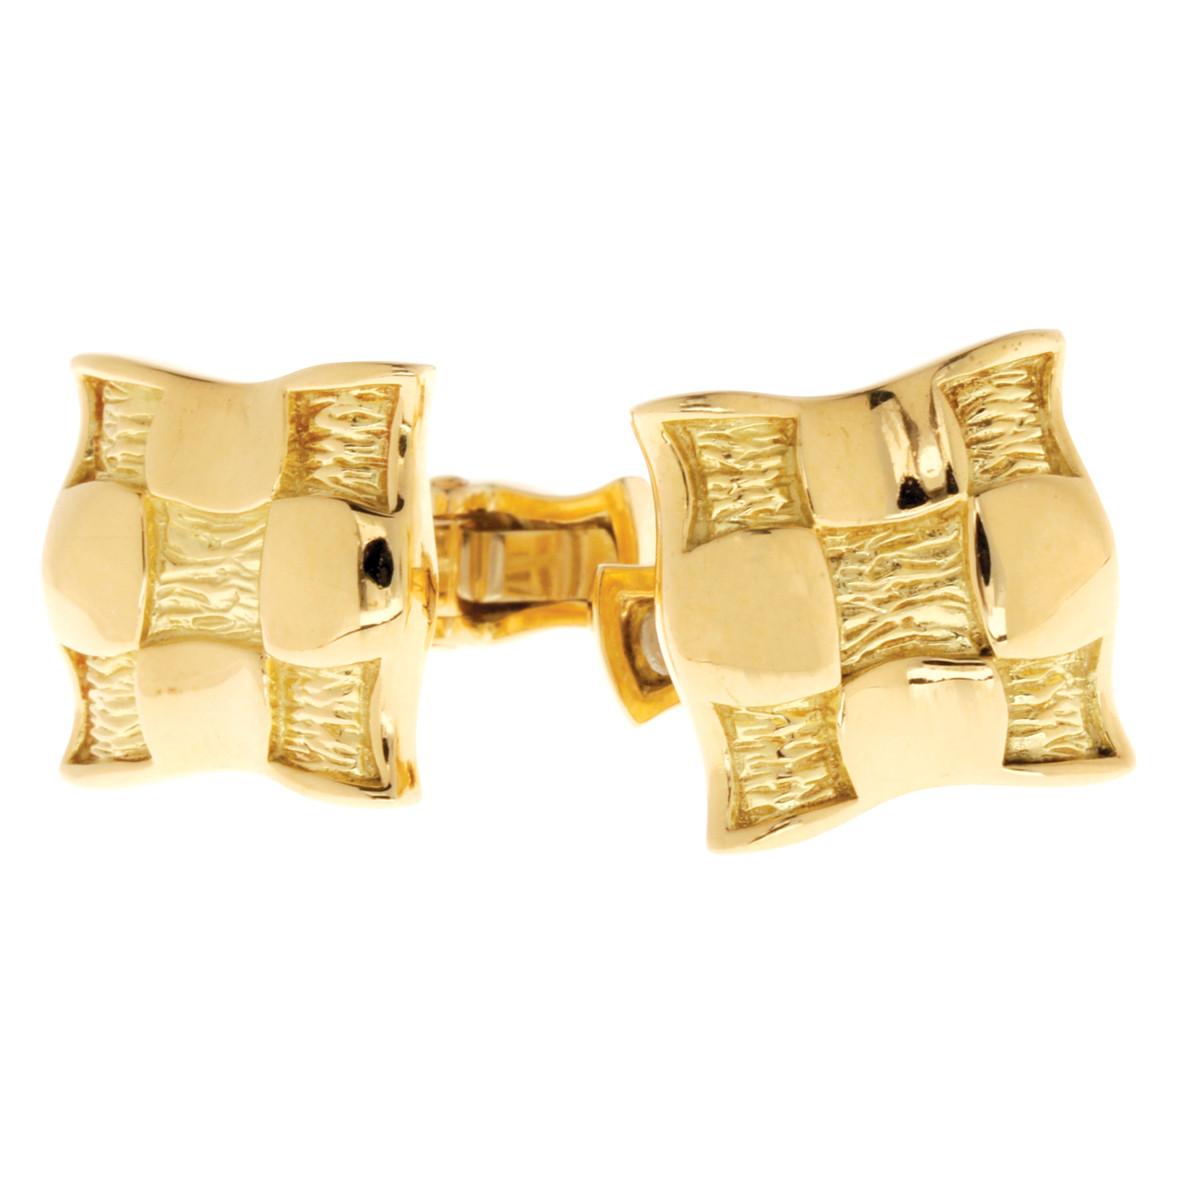 Vintage Tiffany & Co. Checker Cufflinks